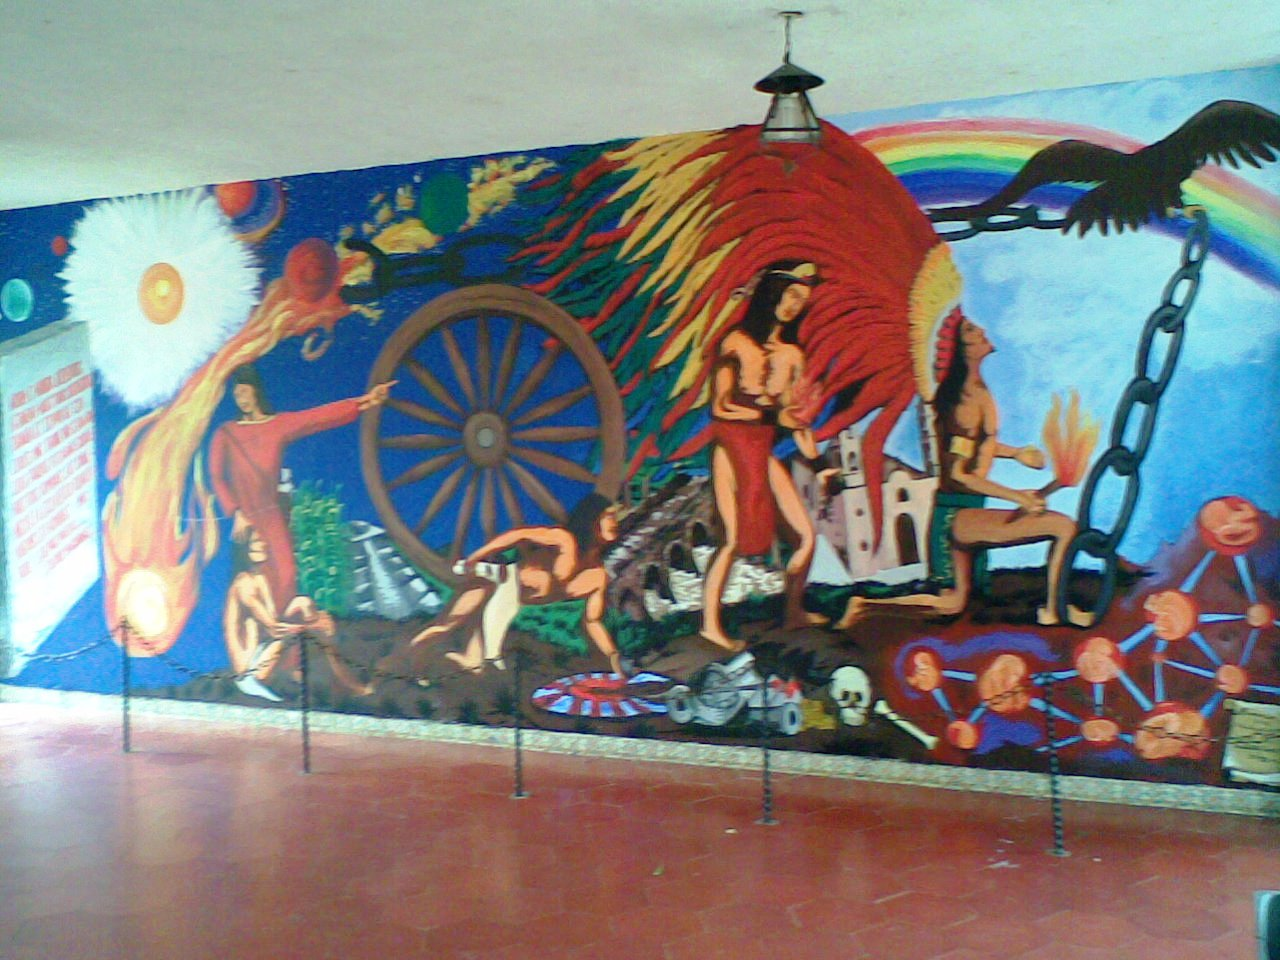 Arcadia salvaterrense murales de la preparatoria oficial for Mural de prepa 1 toluca